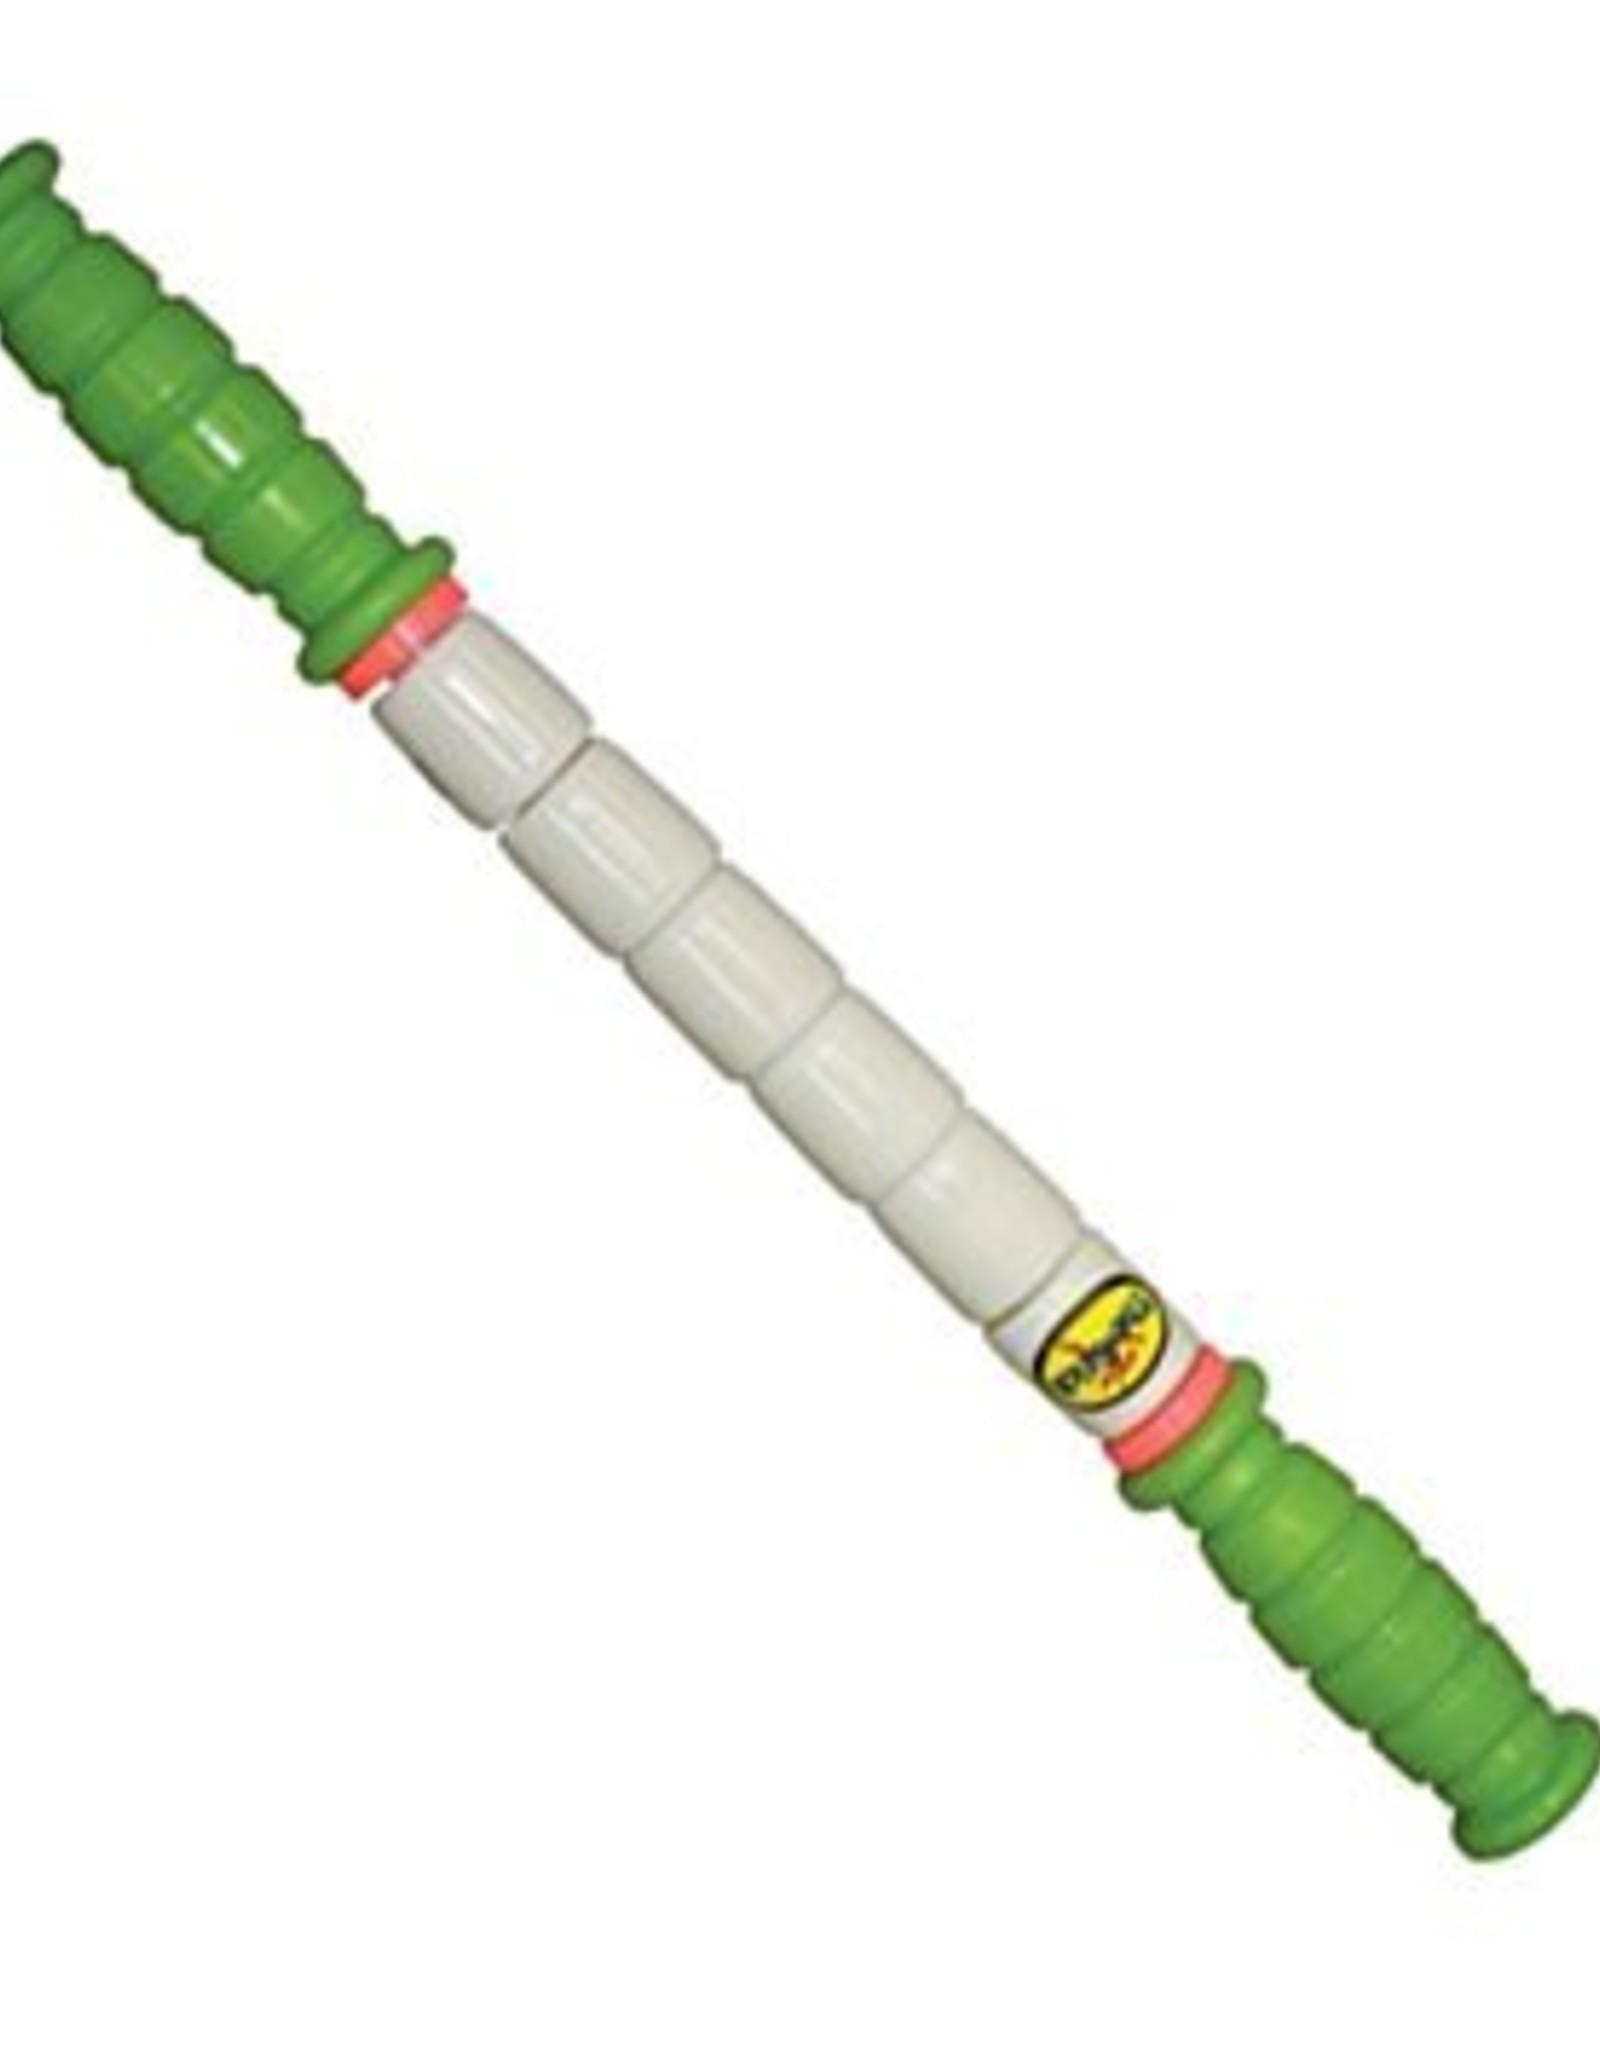 The Stick LITTLE STICK